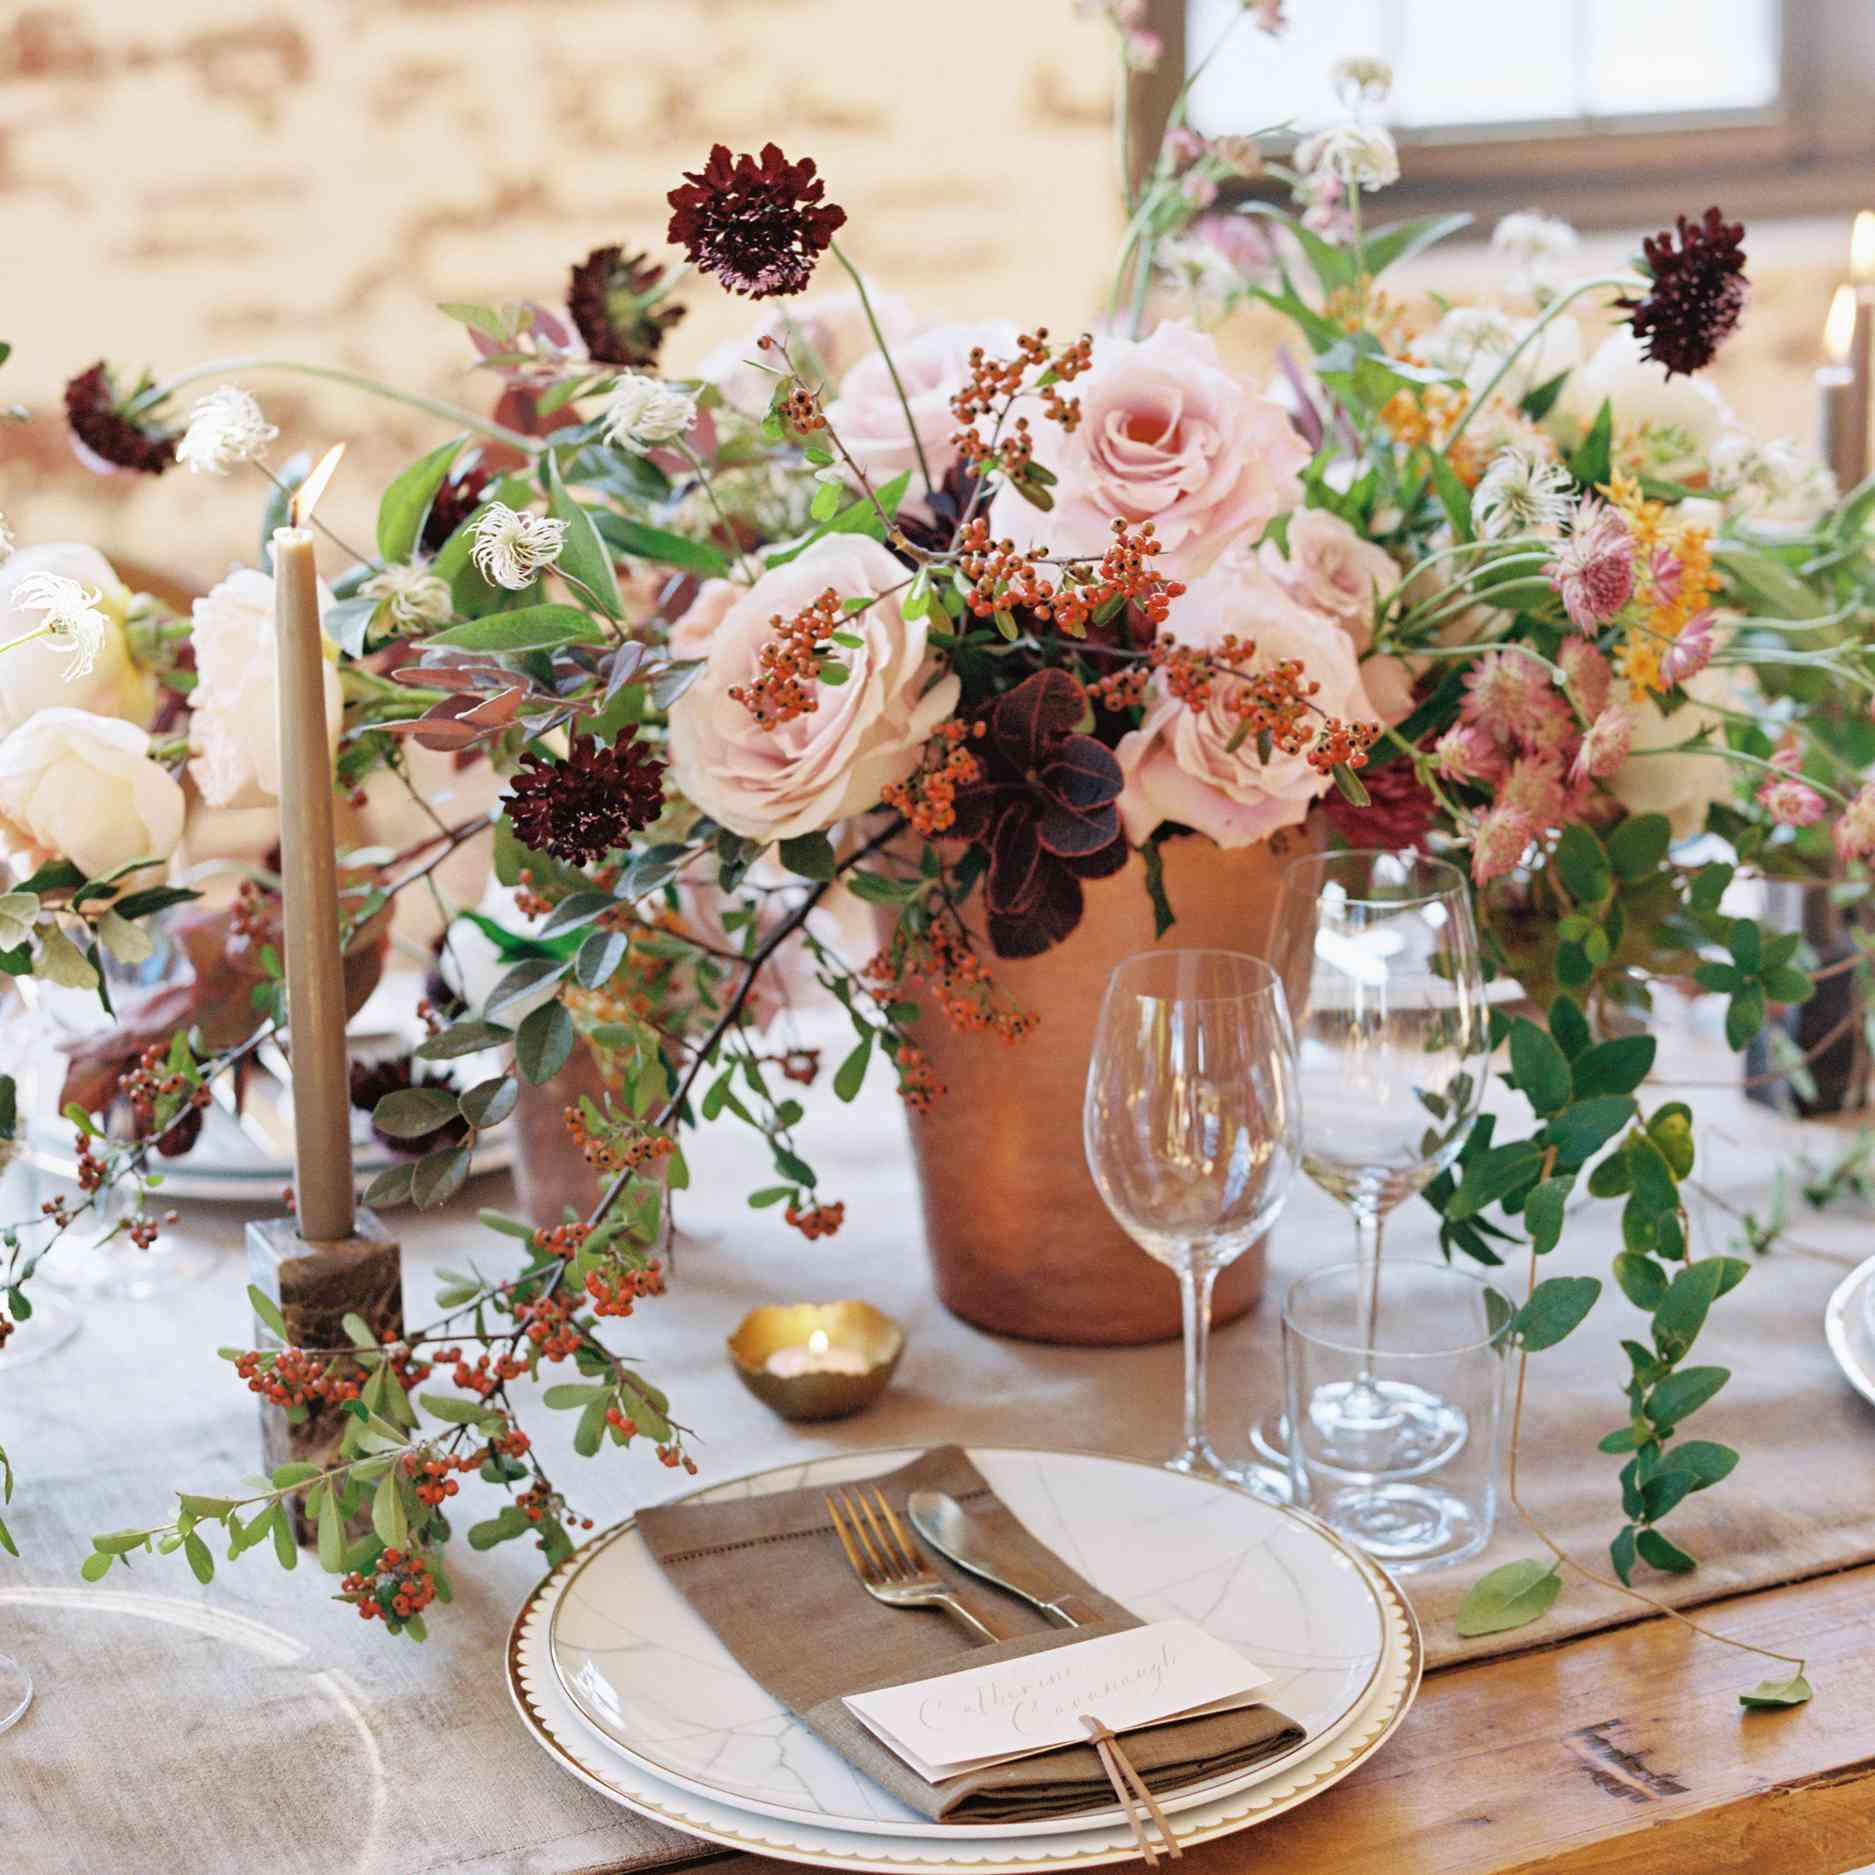 17 Fresh Ideas For A Fall Wedding Tablescape